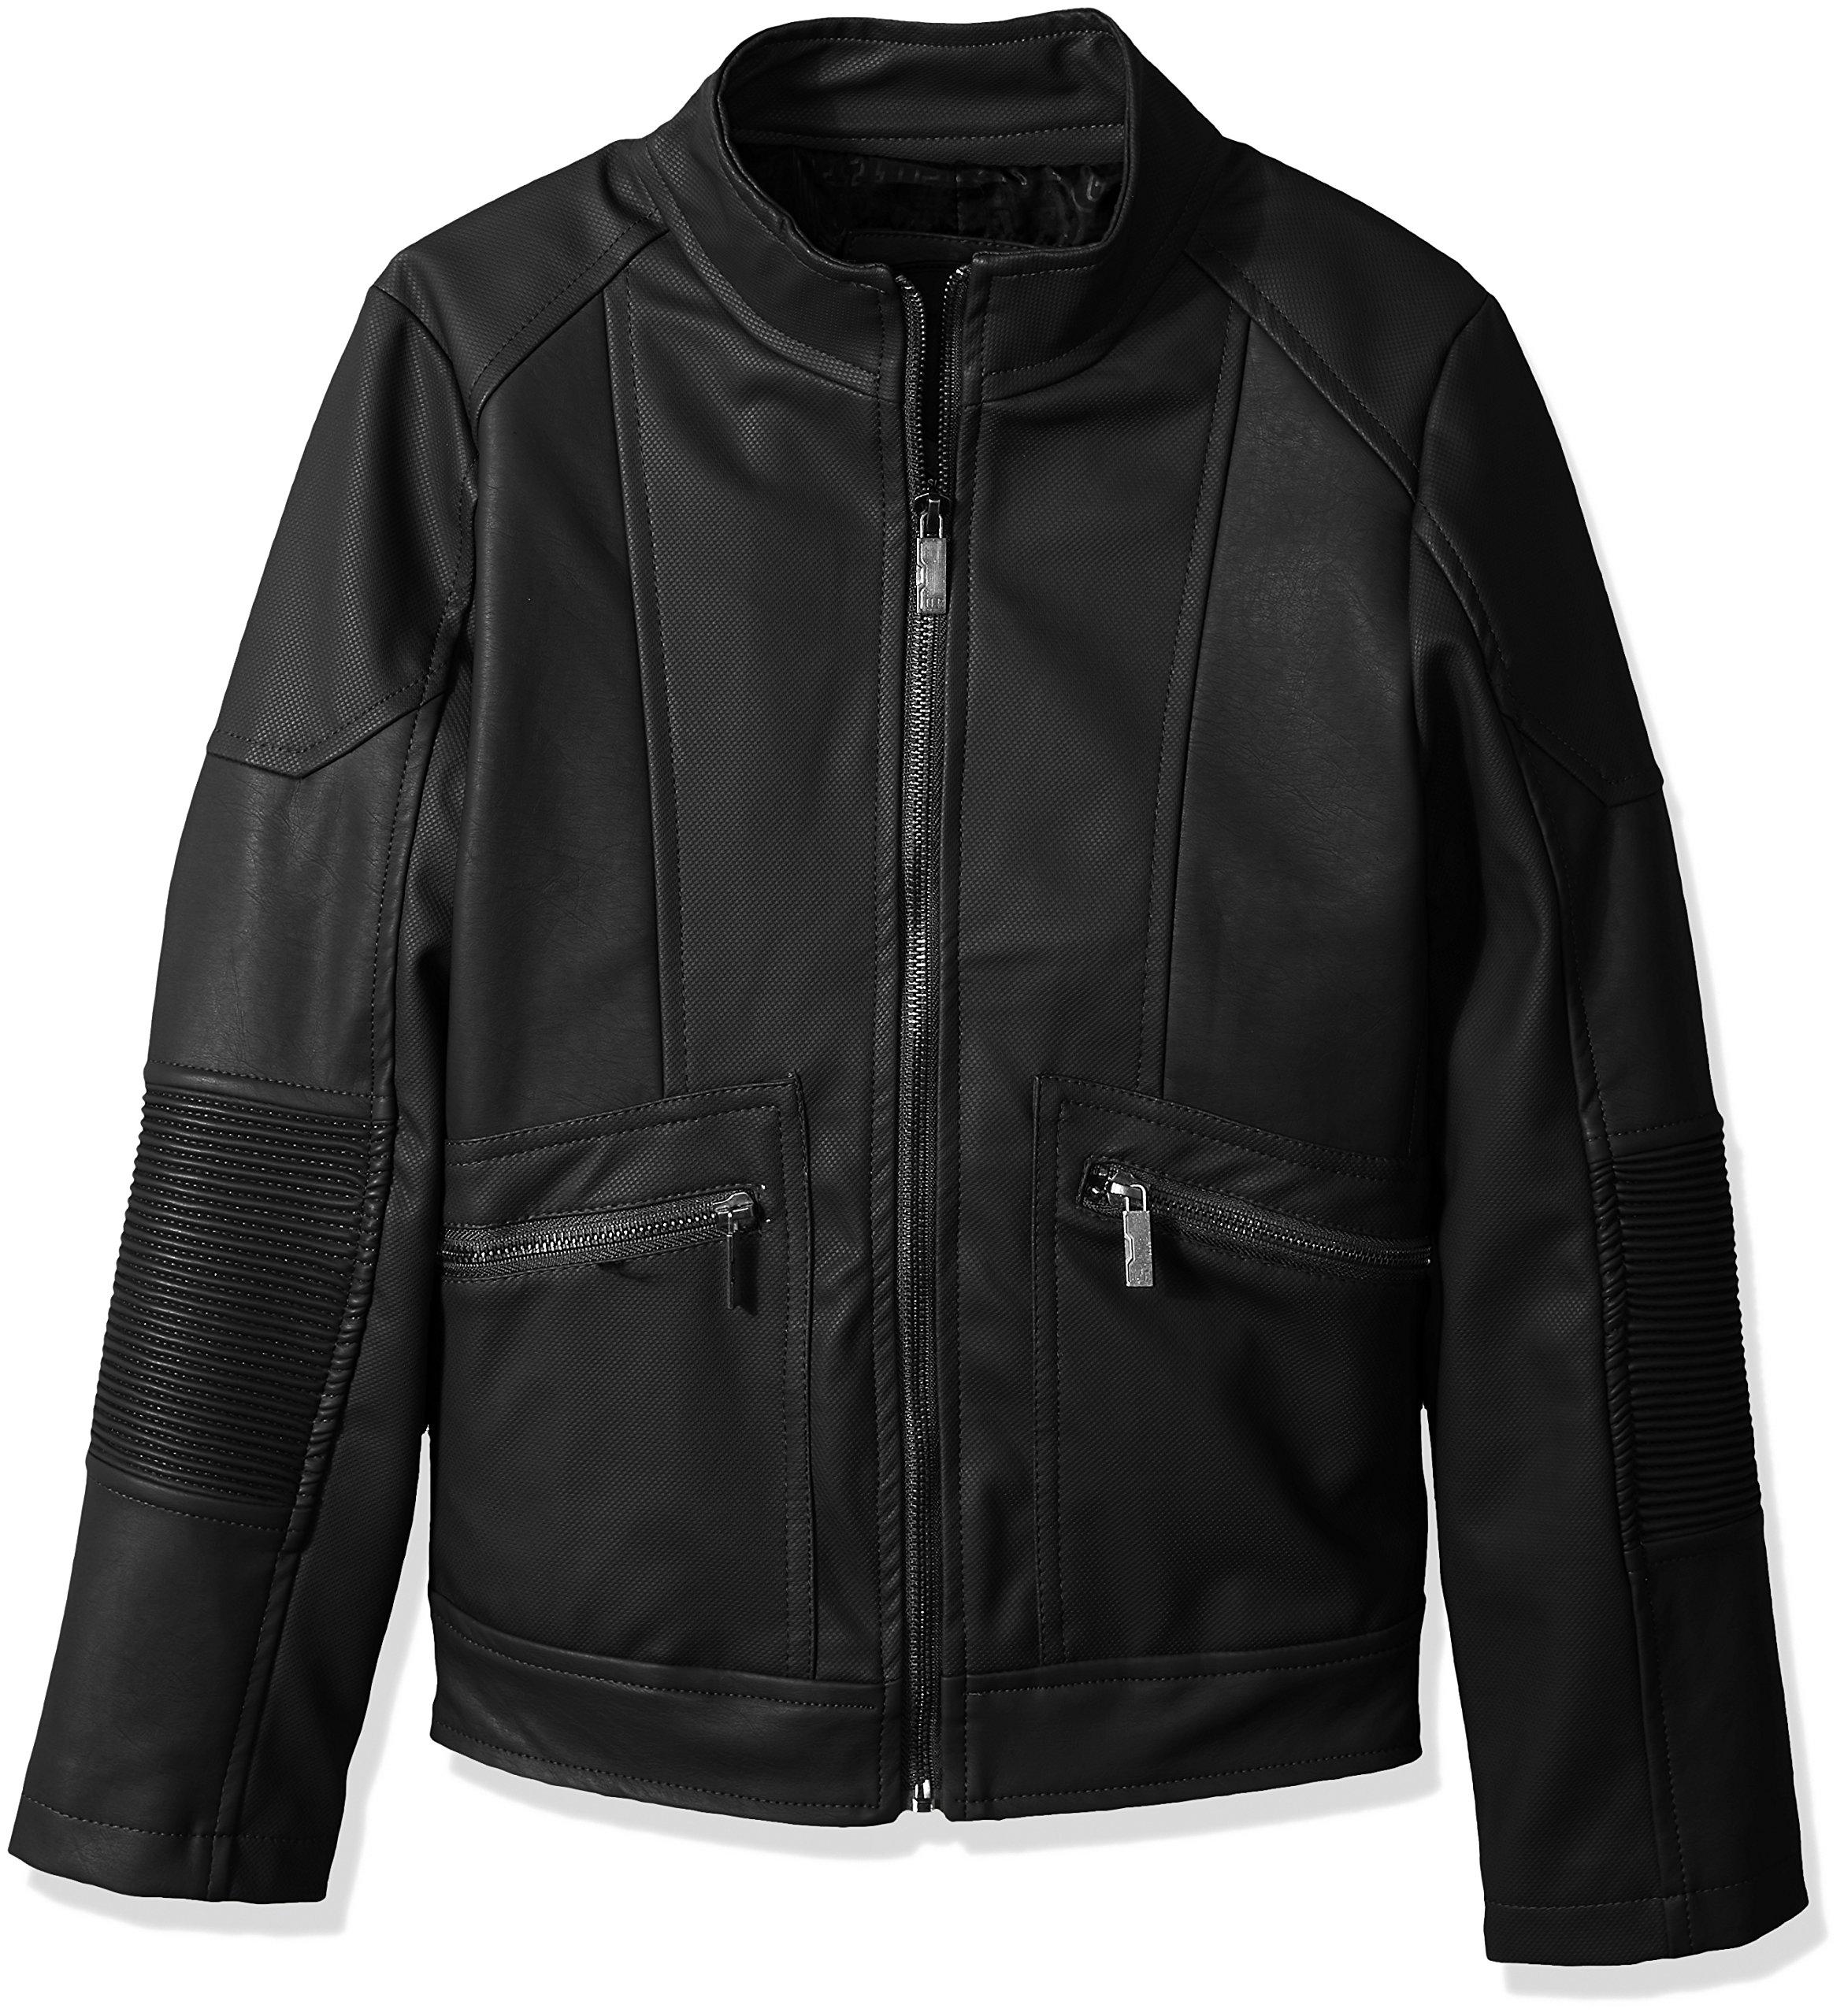 Urban Republic Big Boys' Texture Faux Leather Moto Jacket, Black, 10/12 by Urban Republic